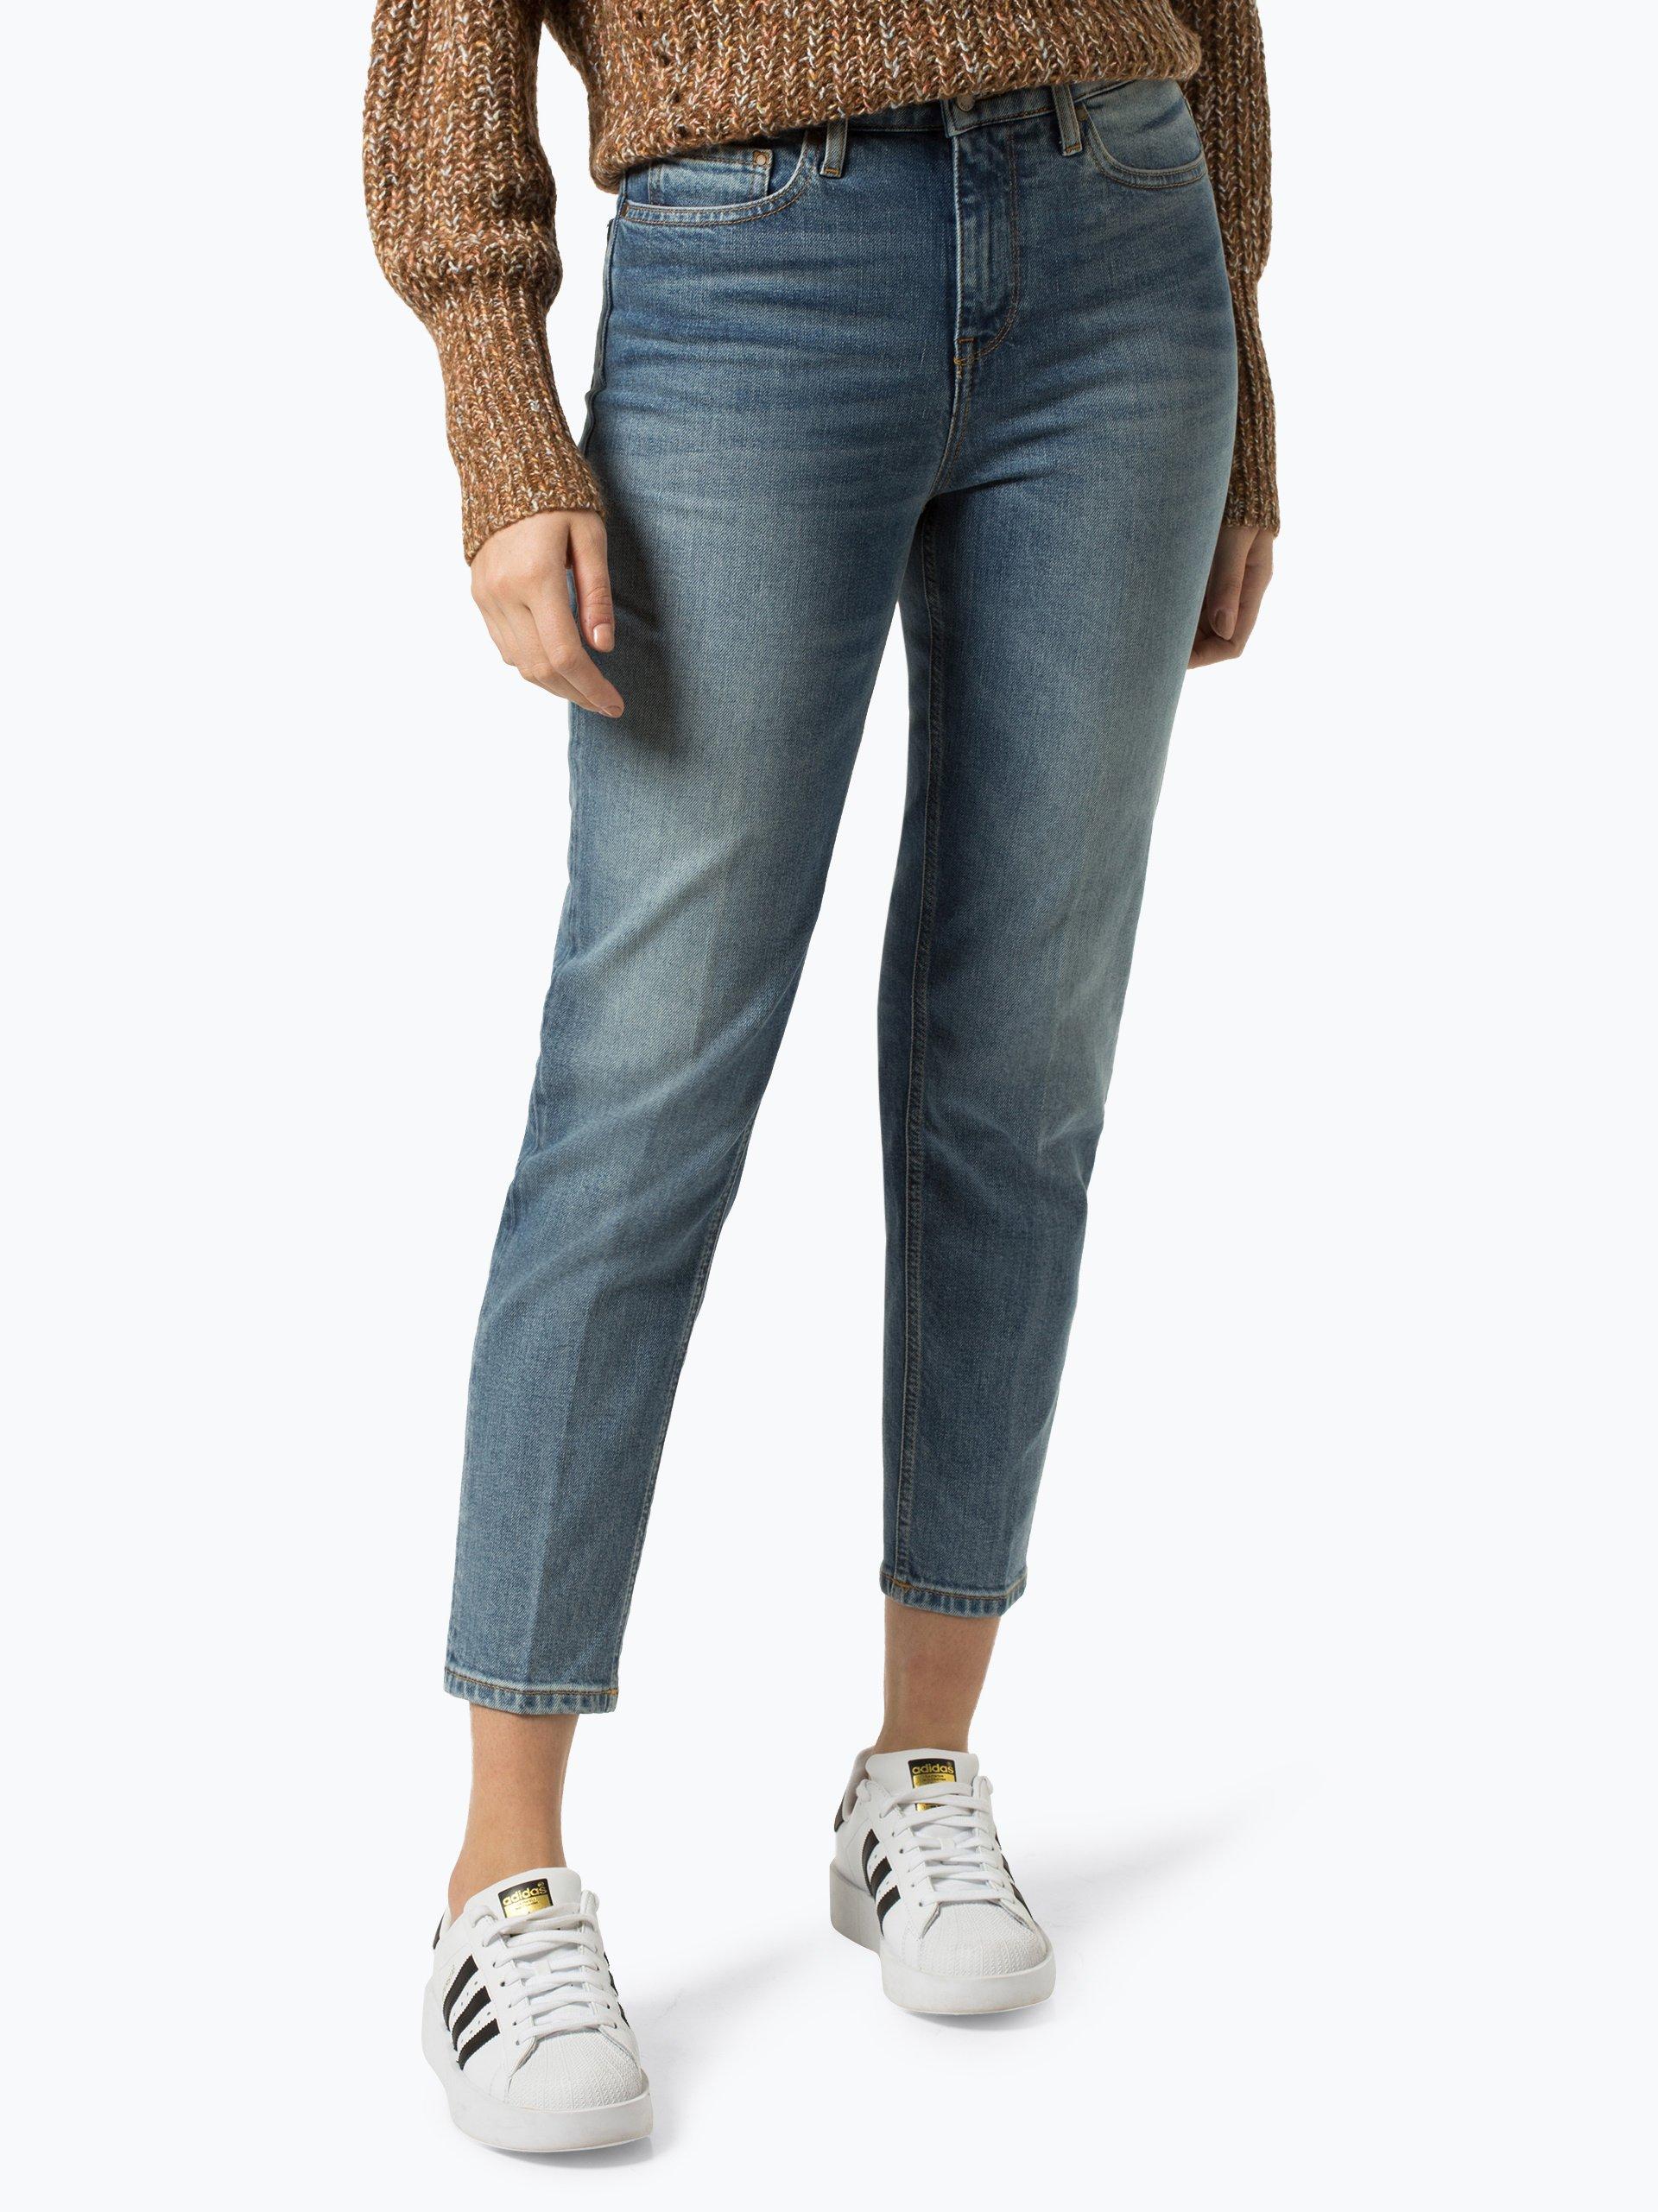 Tommy Hilfiger Damen Jeans - Gramercy